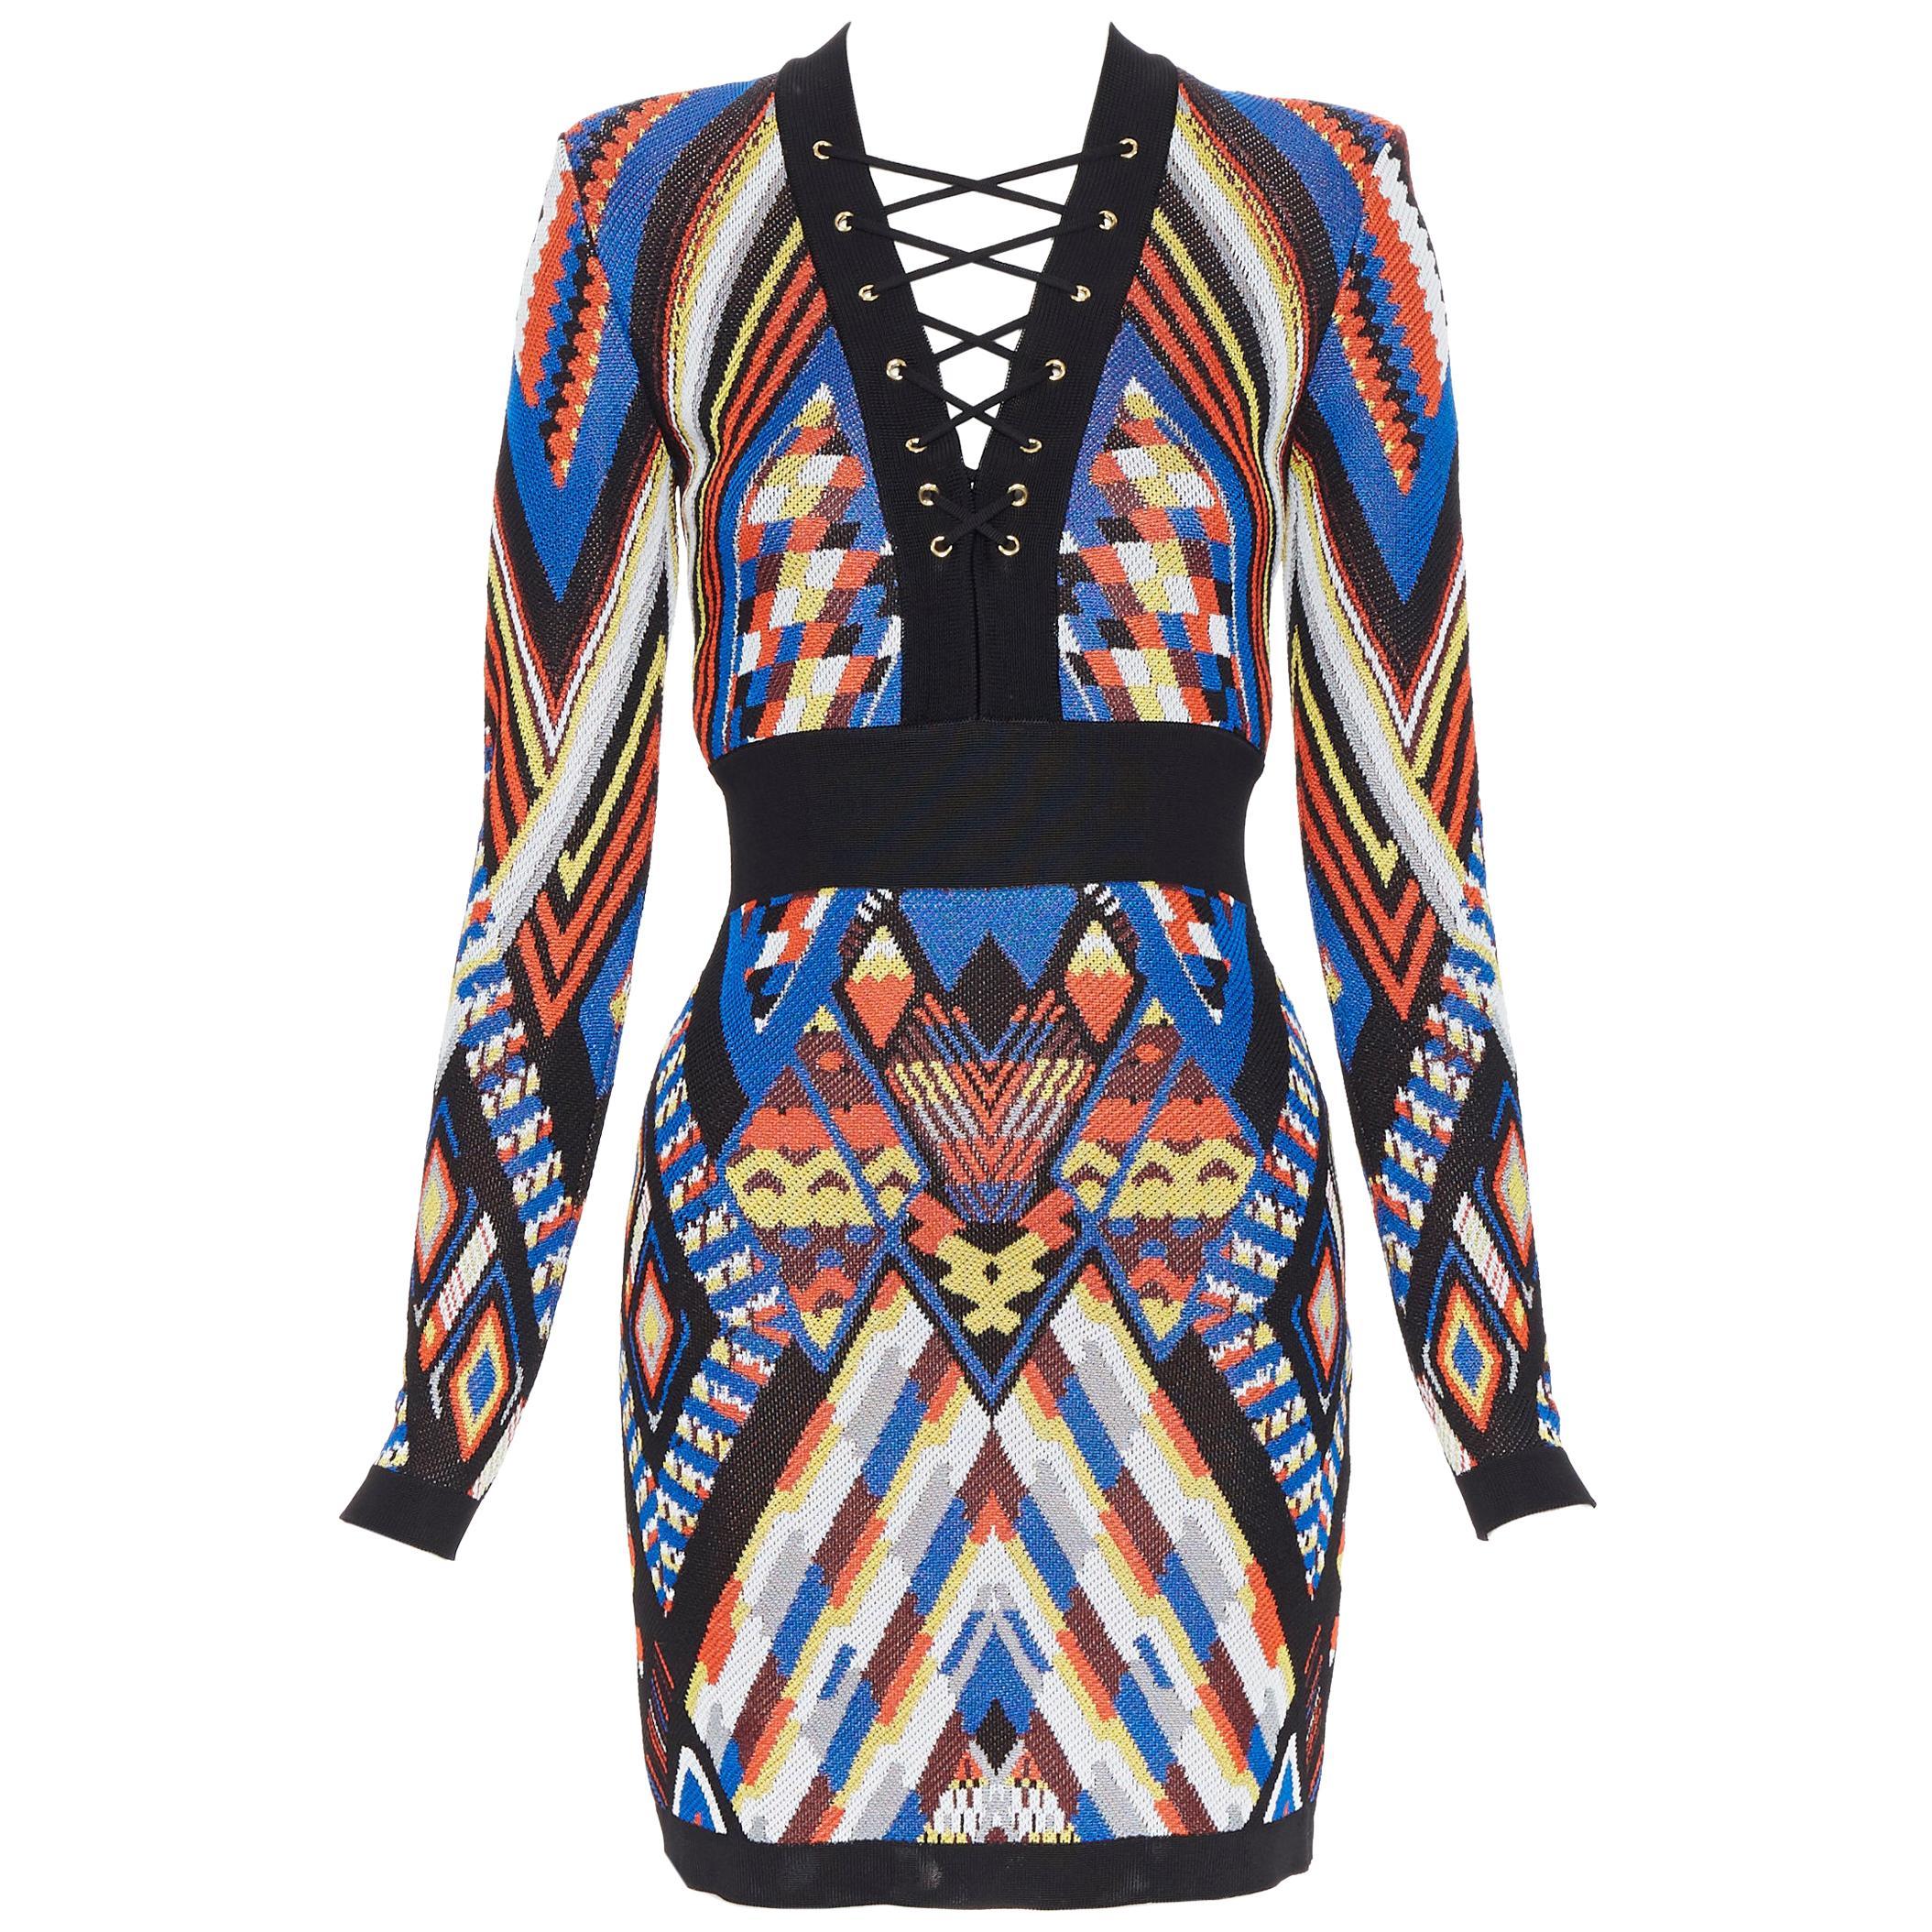 new BALMAIN Runway ethnic tribal knitted lace V-neck bodycon mini dress FR36 S